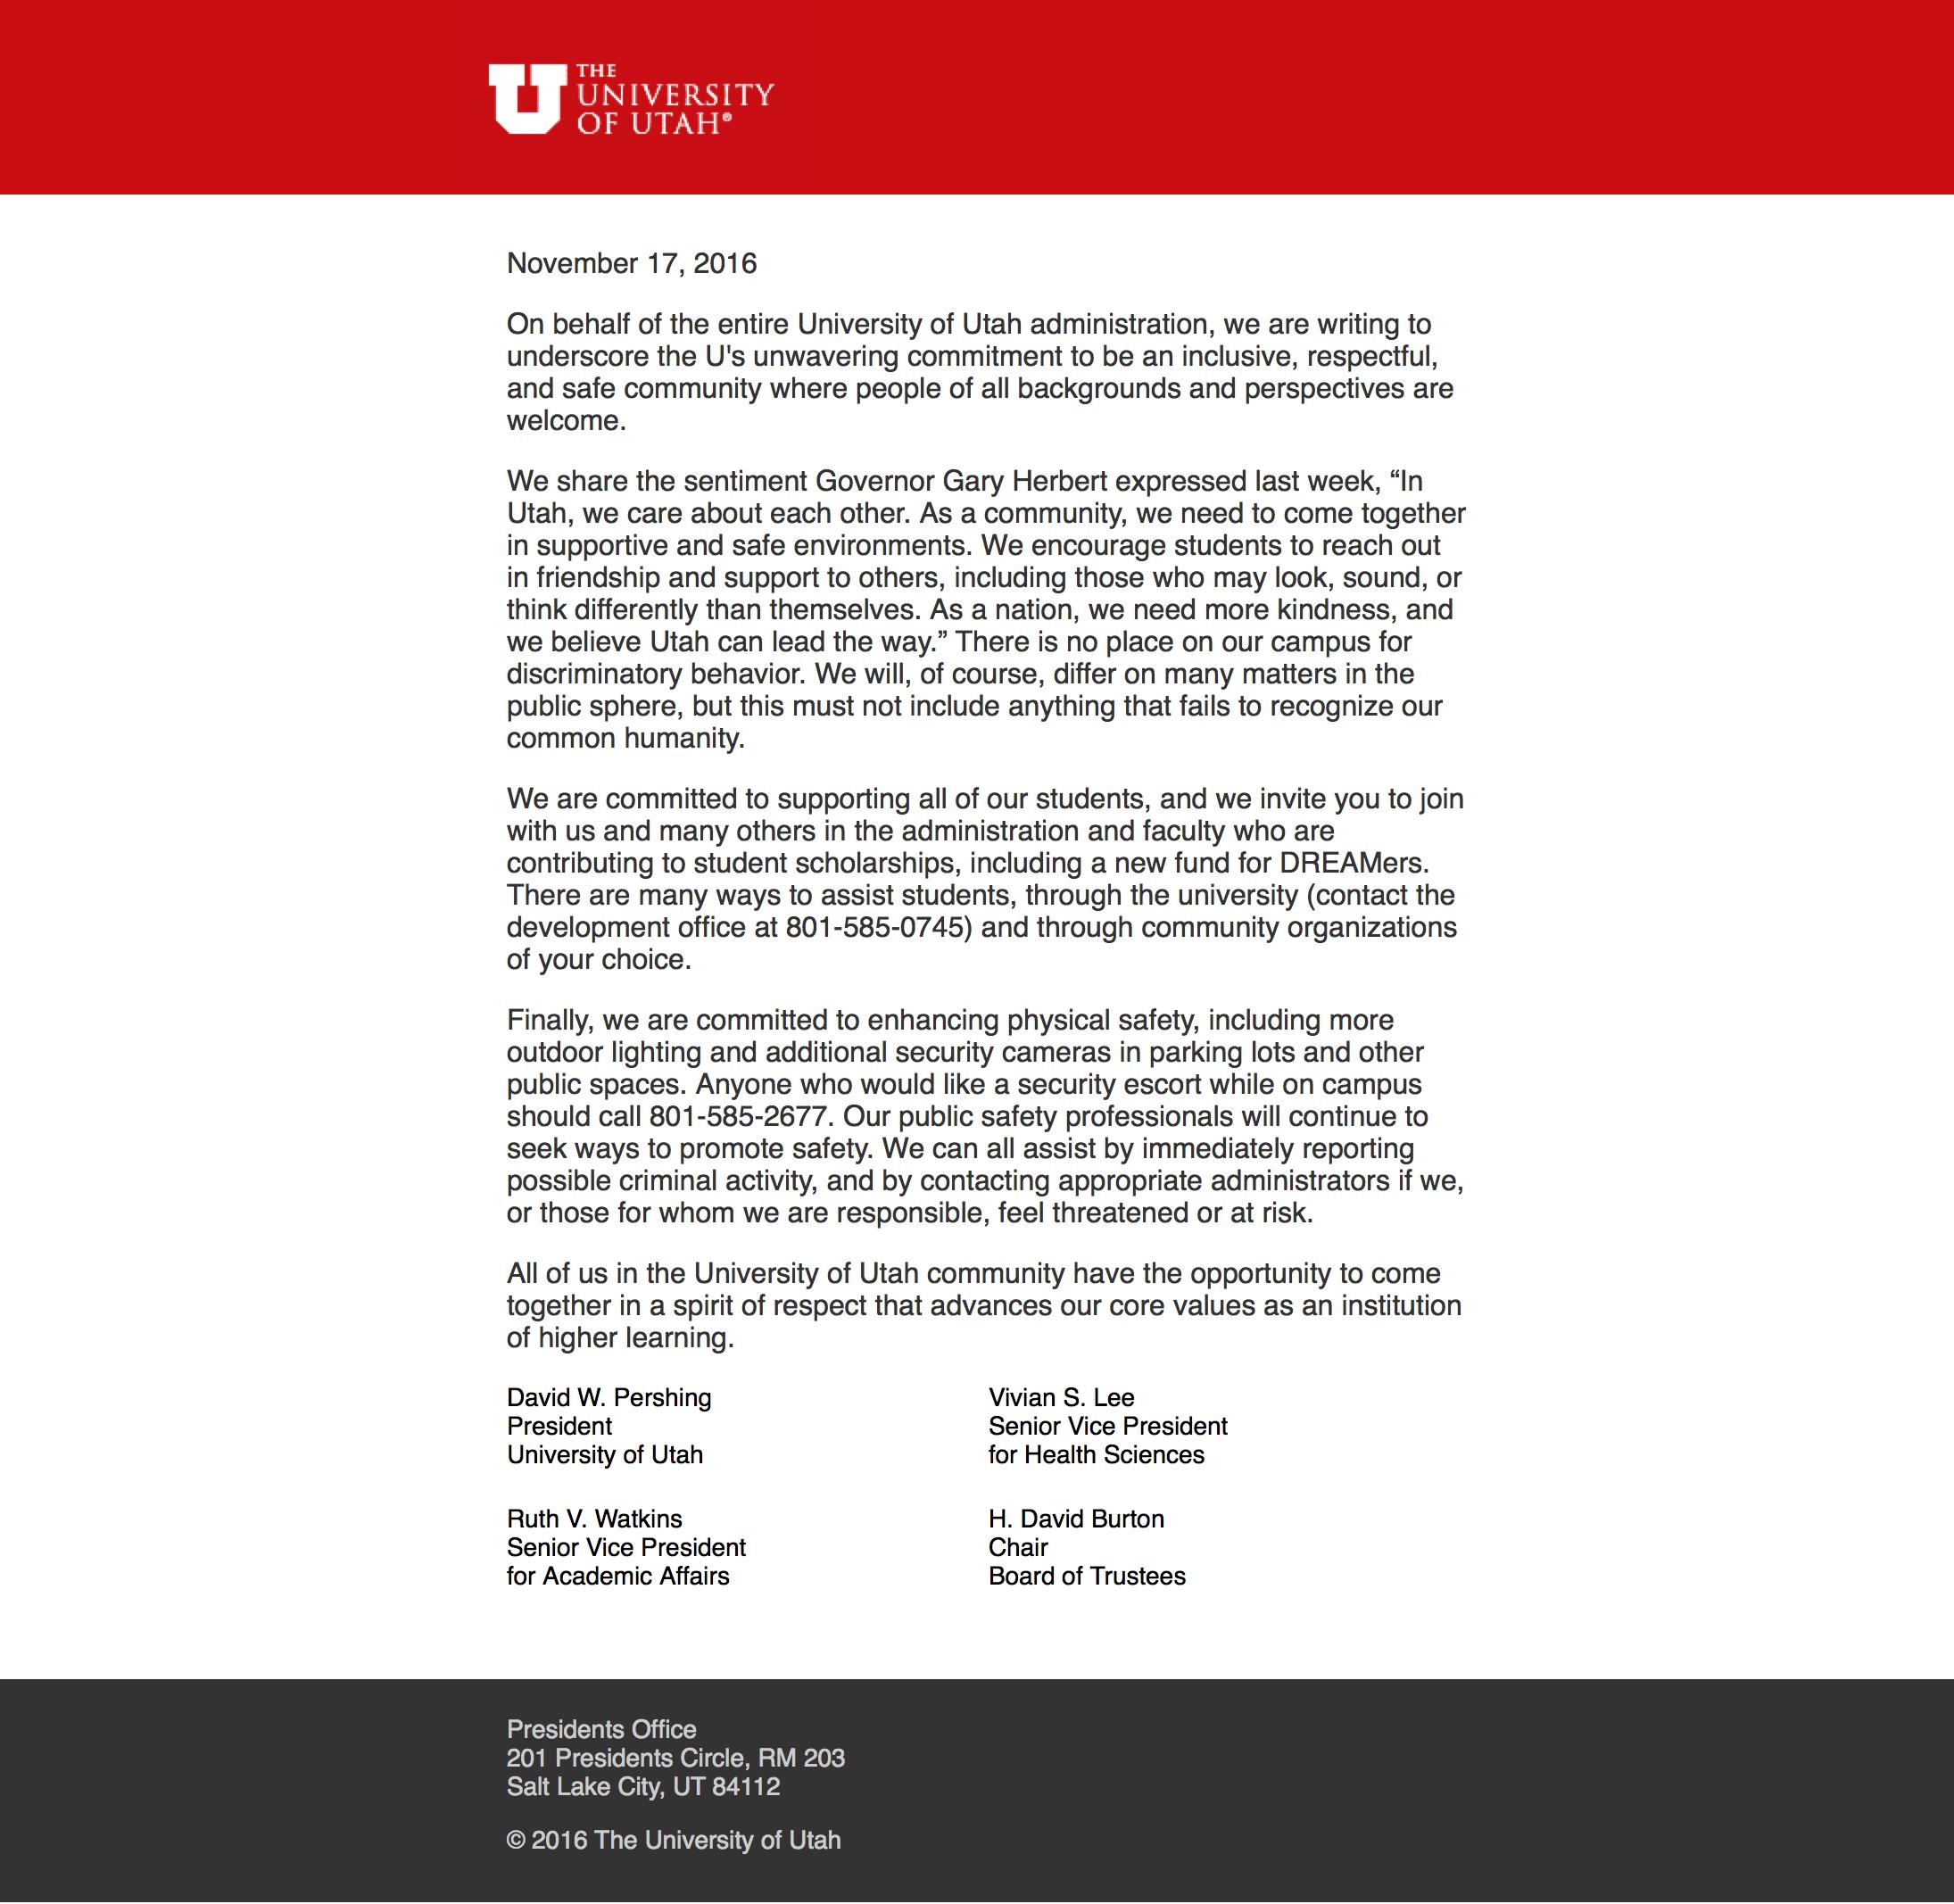 letter by University of Utah leadership